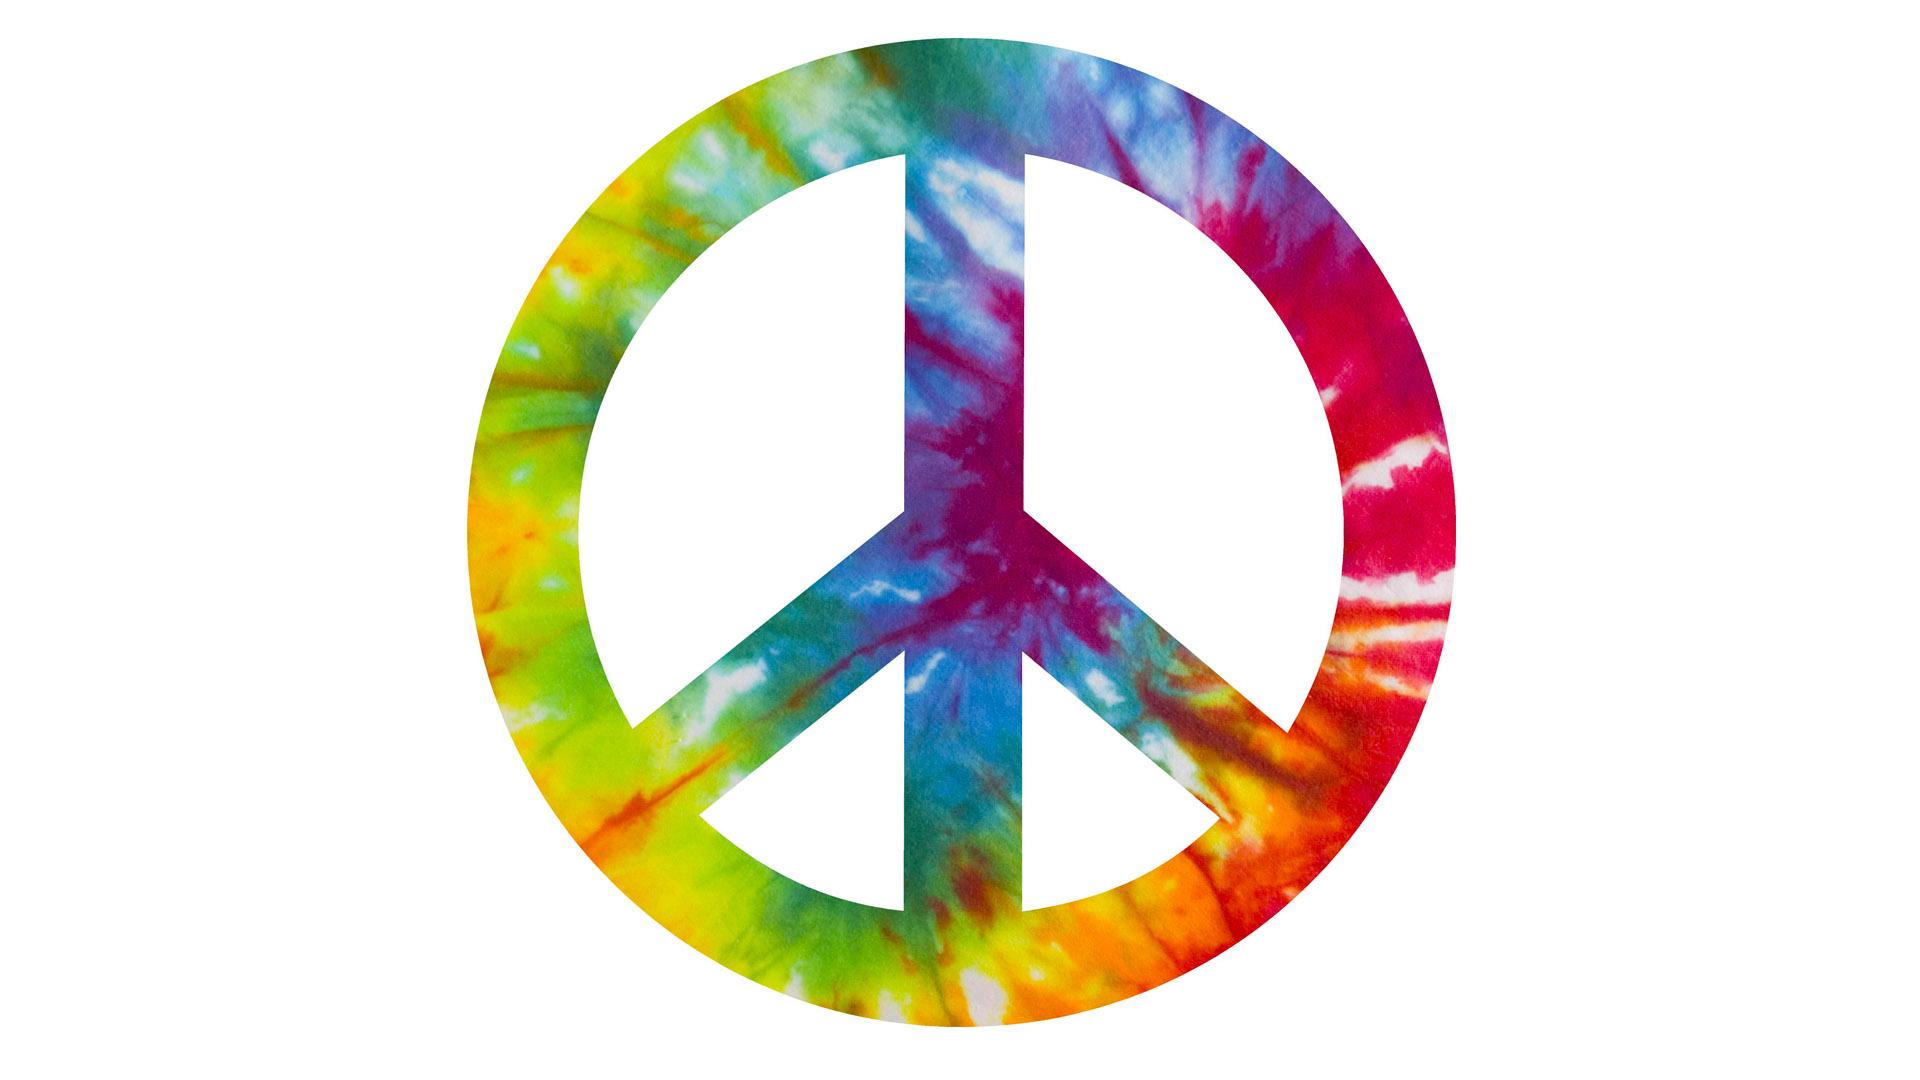 peace love logo hd wallpaper peace love logo hd hd wallpaper 1920x1080